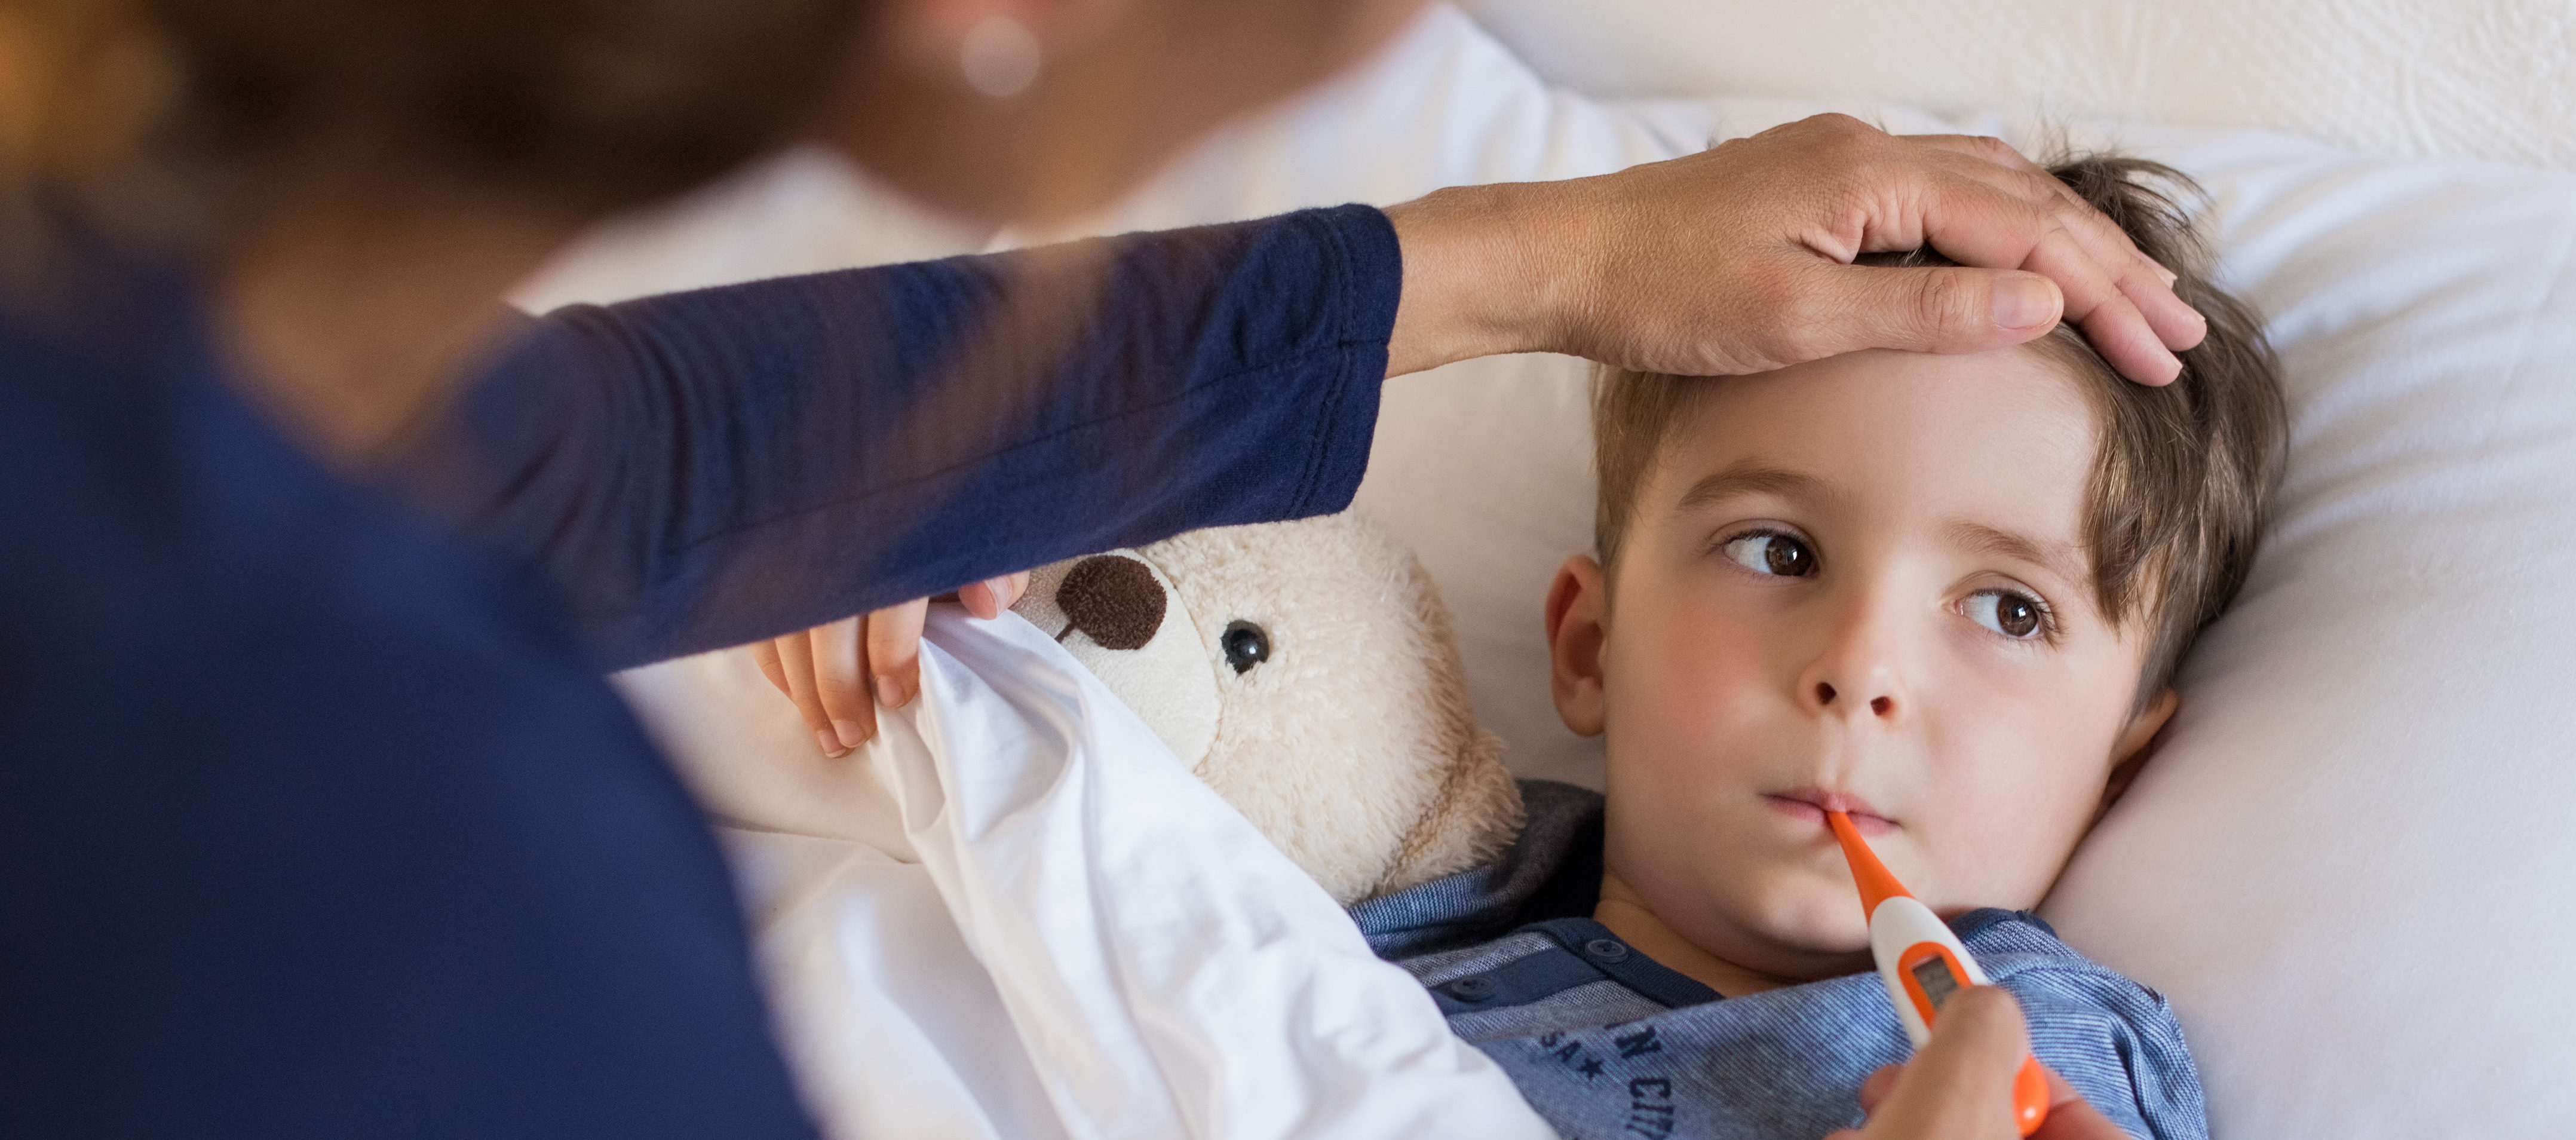 GoWell Urgent Care - Immediate Care Center in Virginia